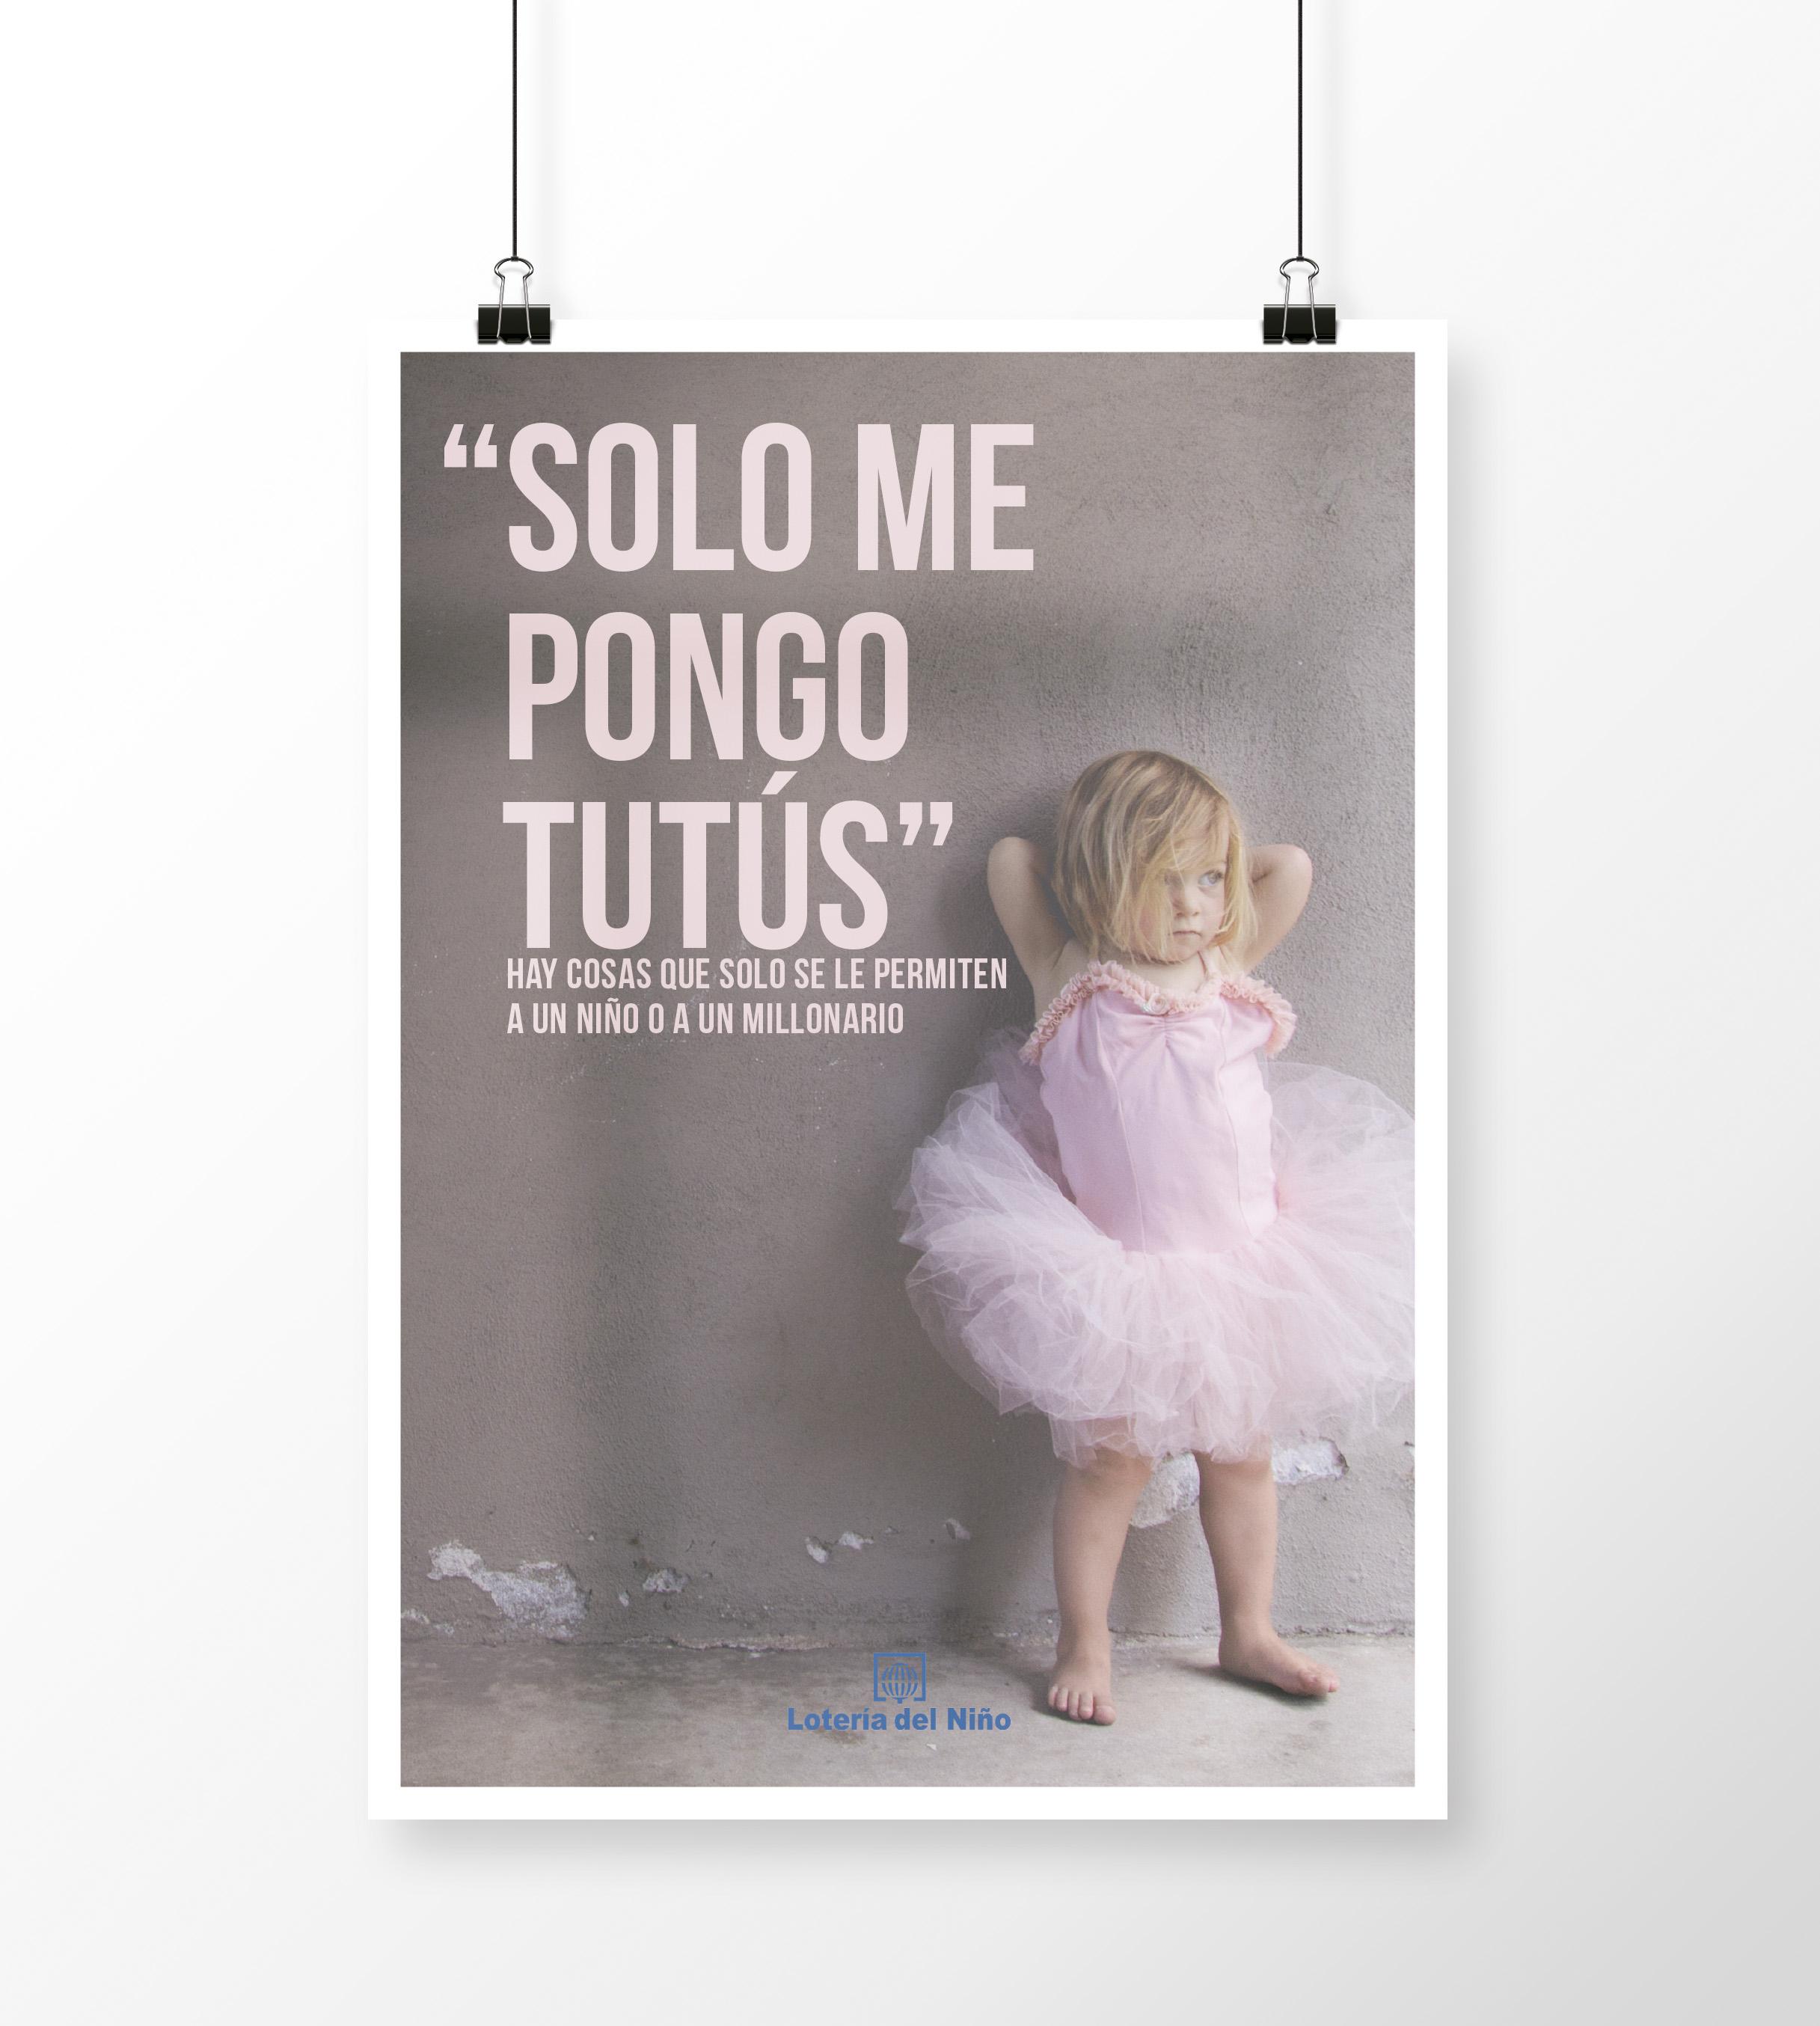 posters-loteríadelniño-03-mockup.jpg